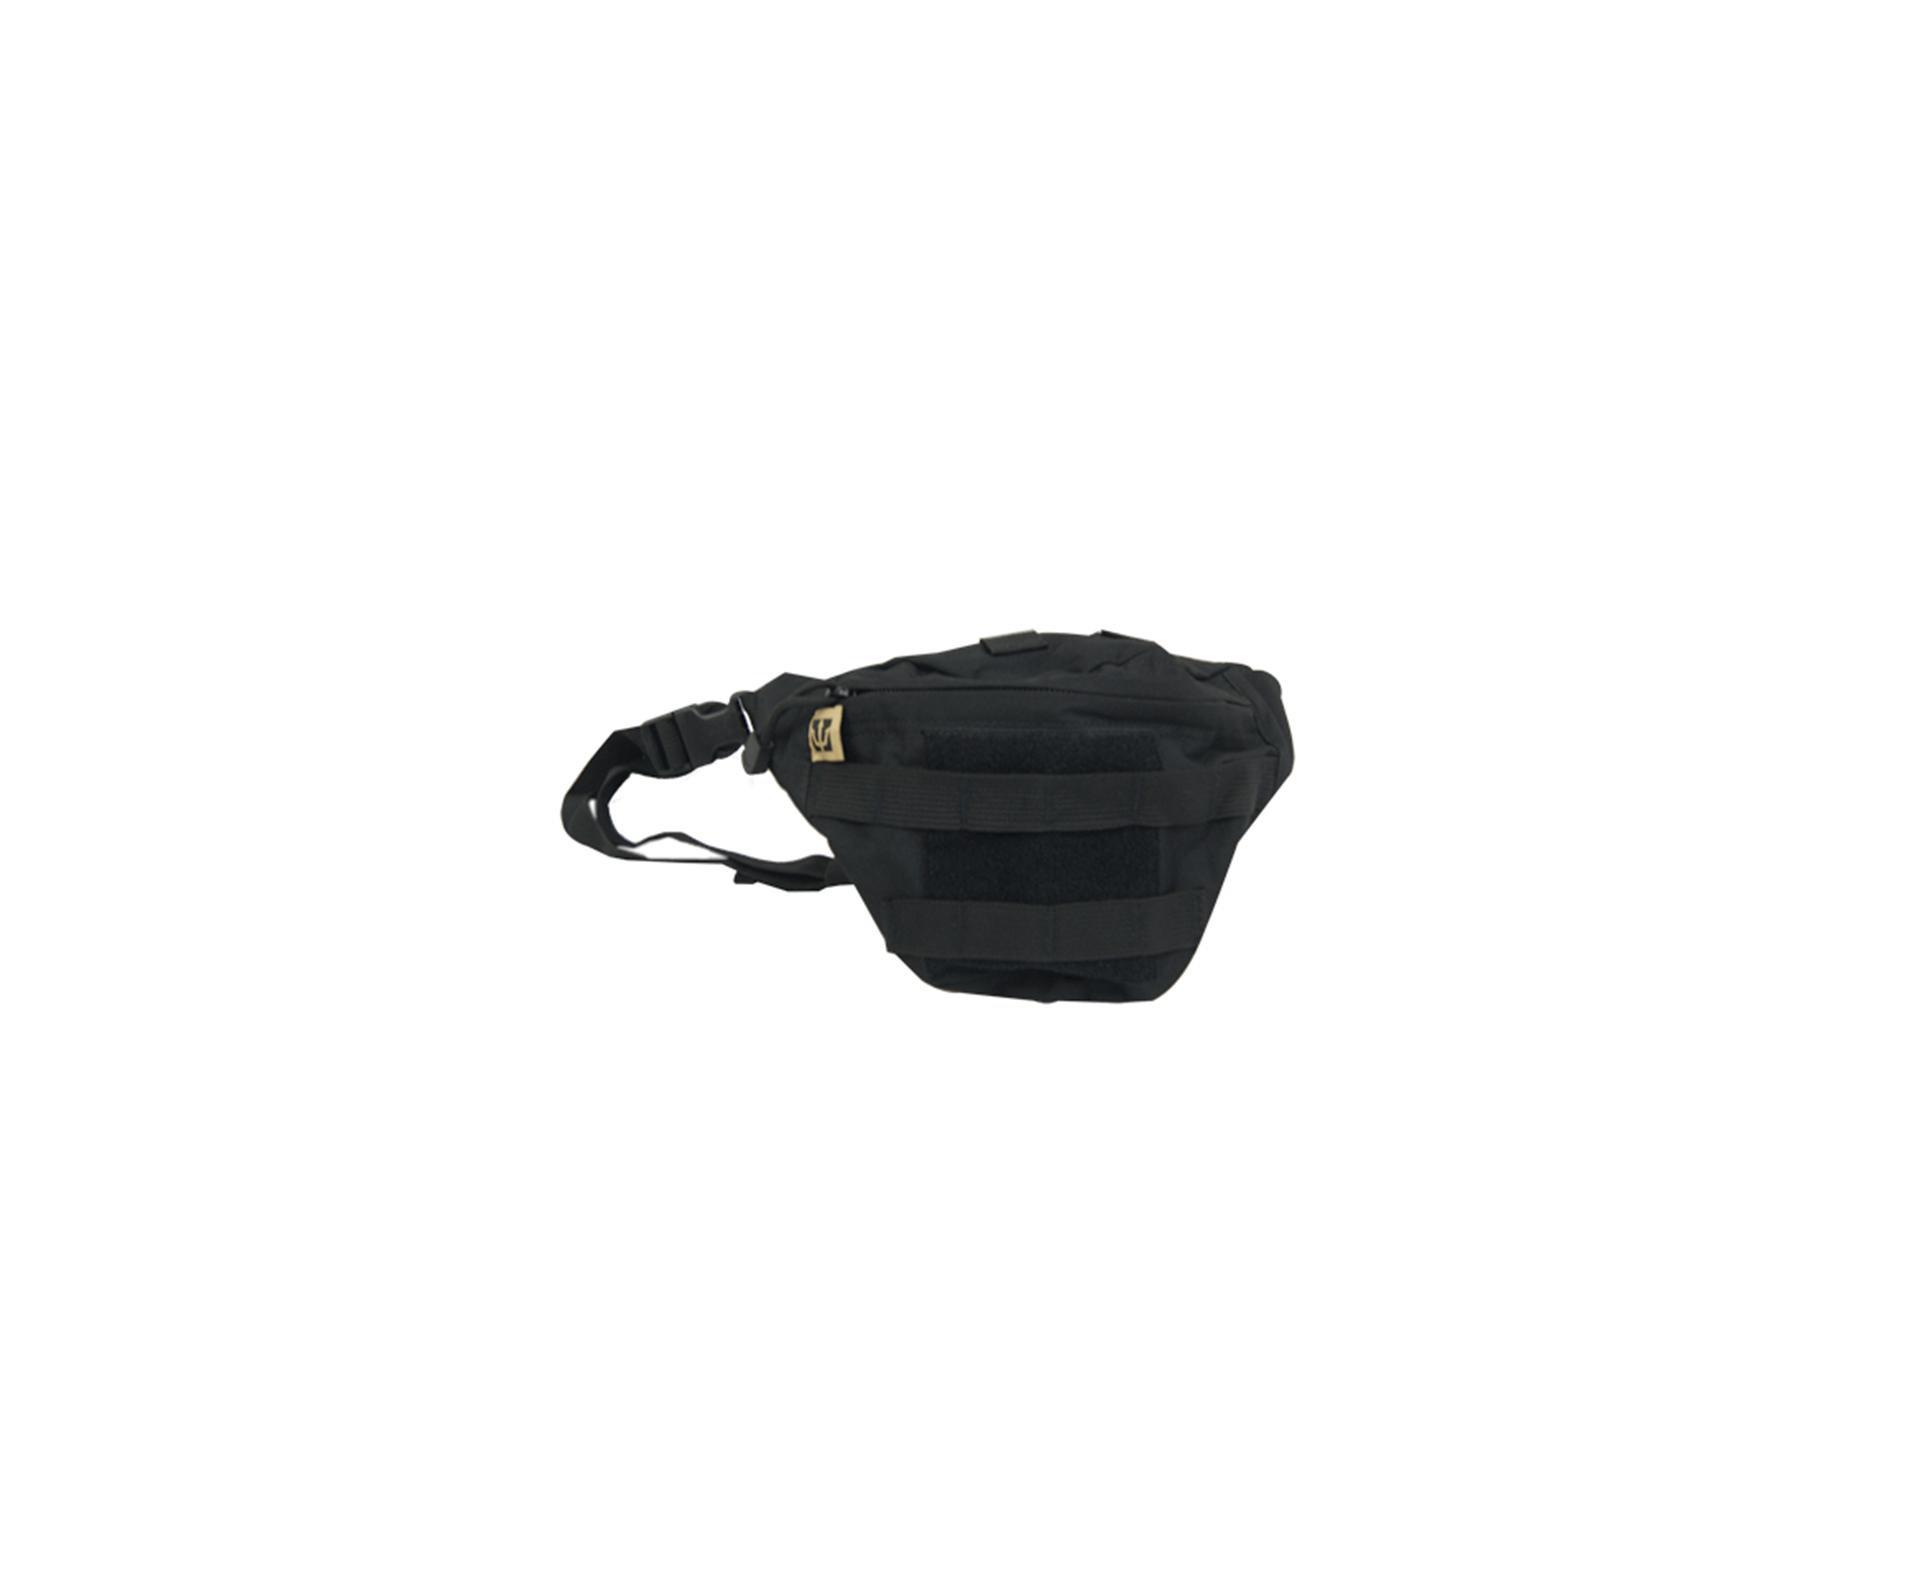 Bolsa Pochete Tática Waist Bag Po-018 Preta - Evo Tactical